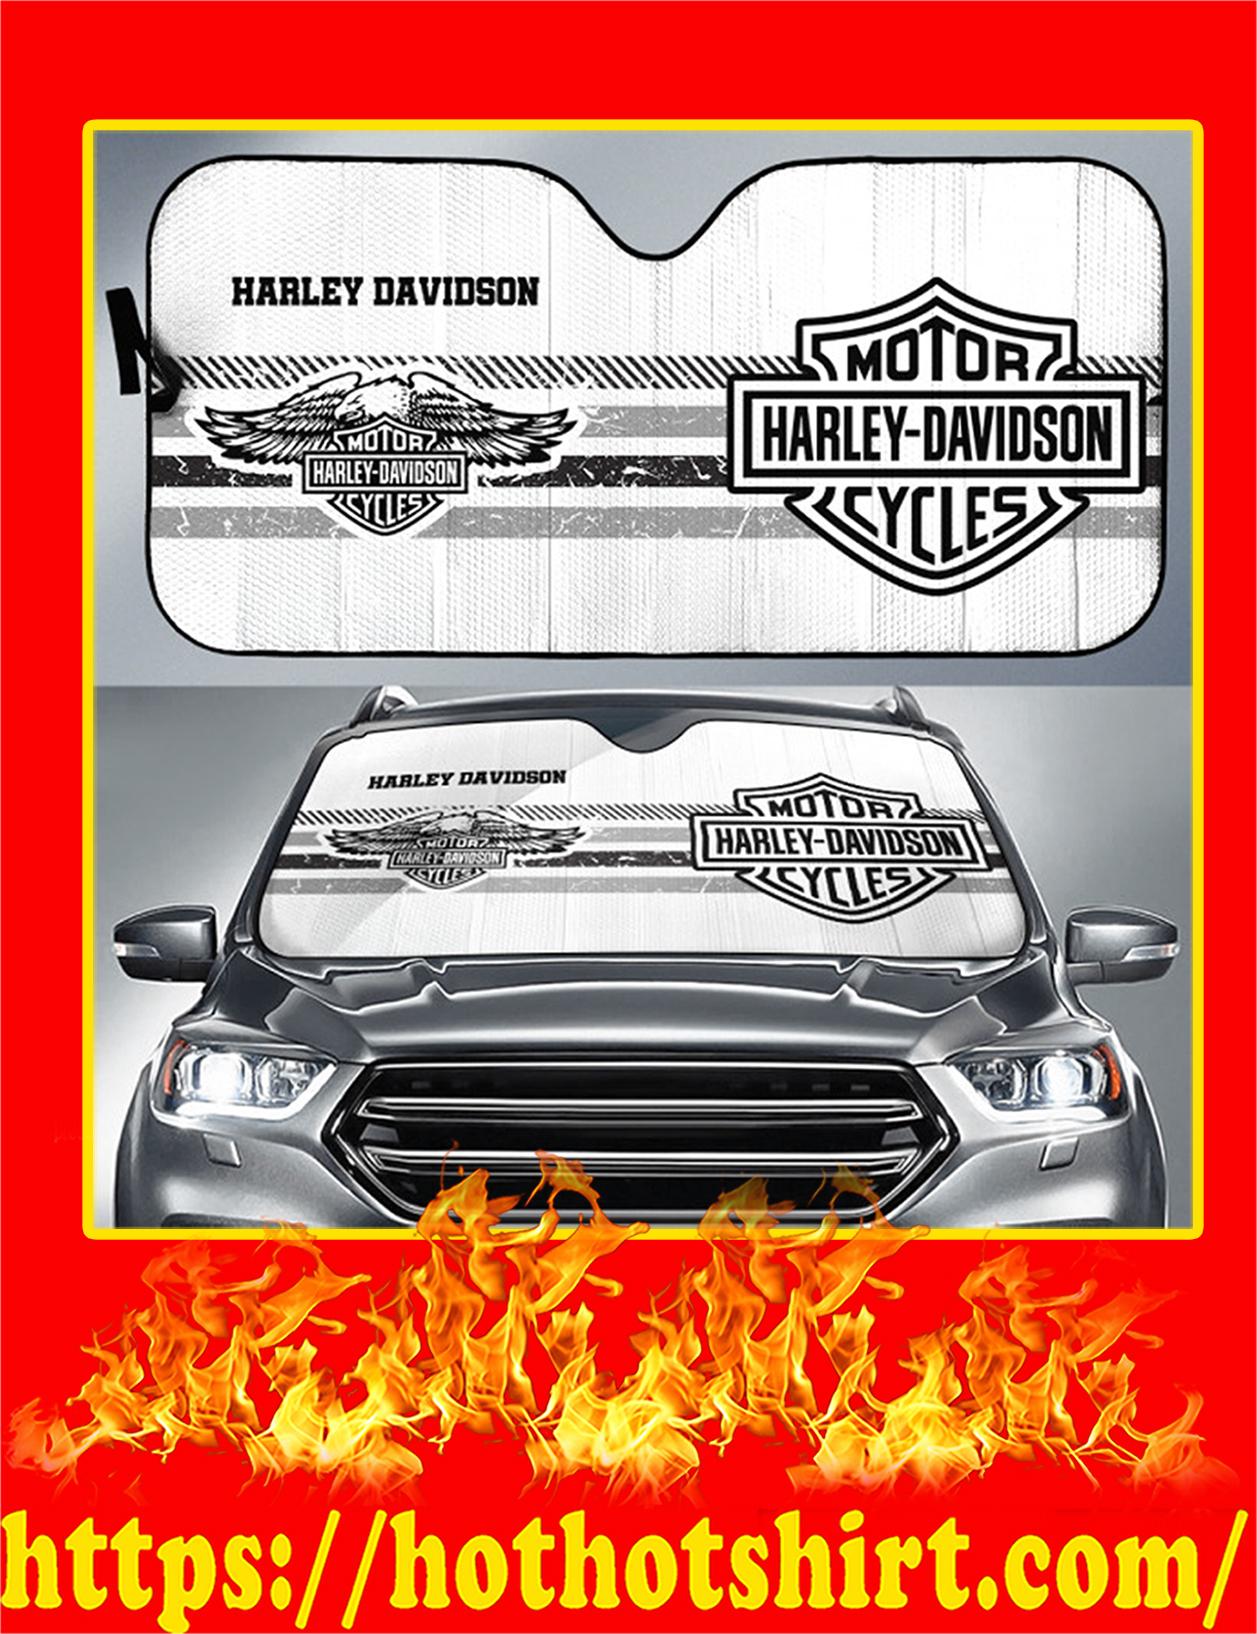 Harley Davidson Motorcycles Auto Sun Shade - Detail